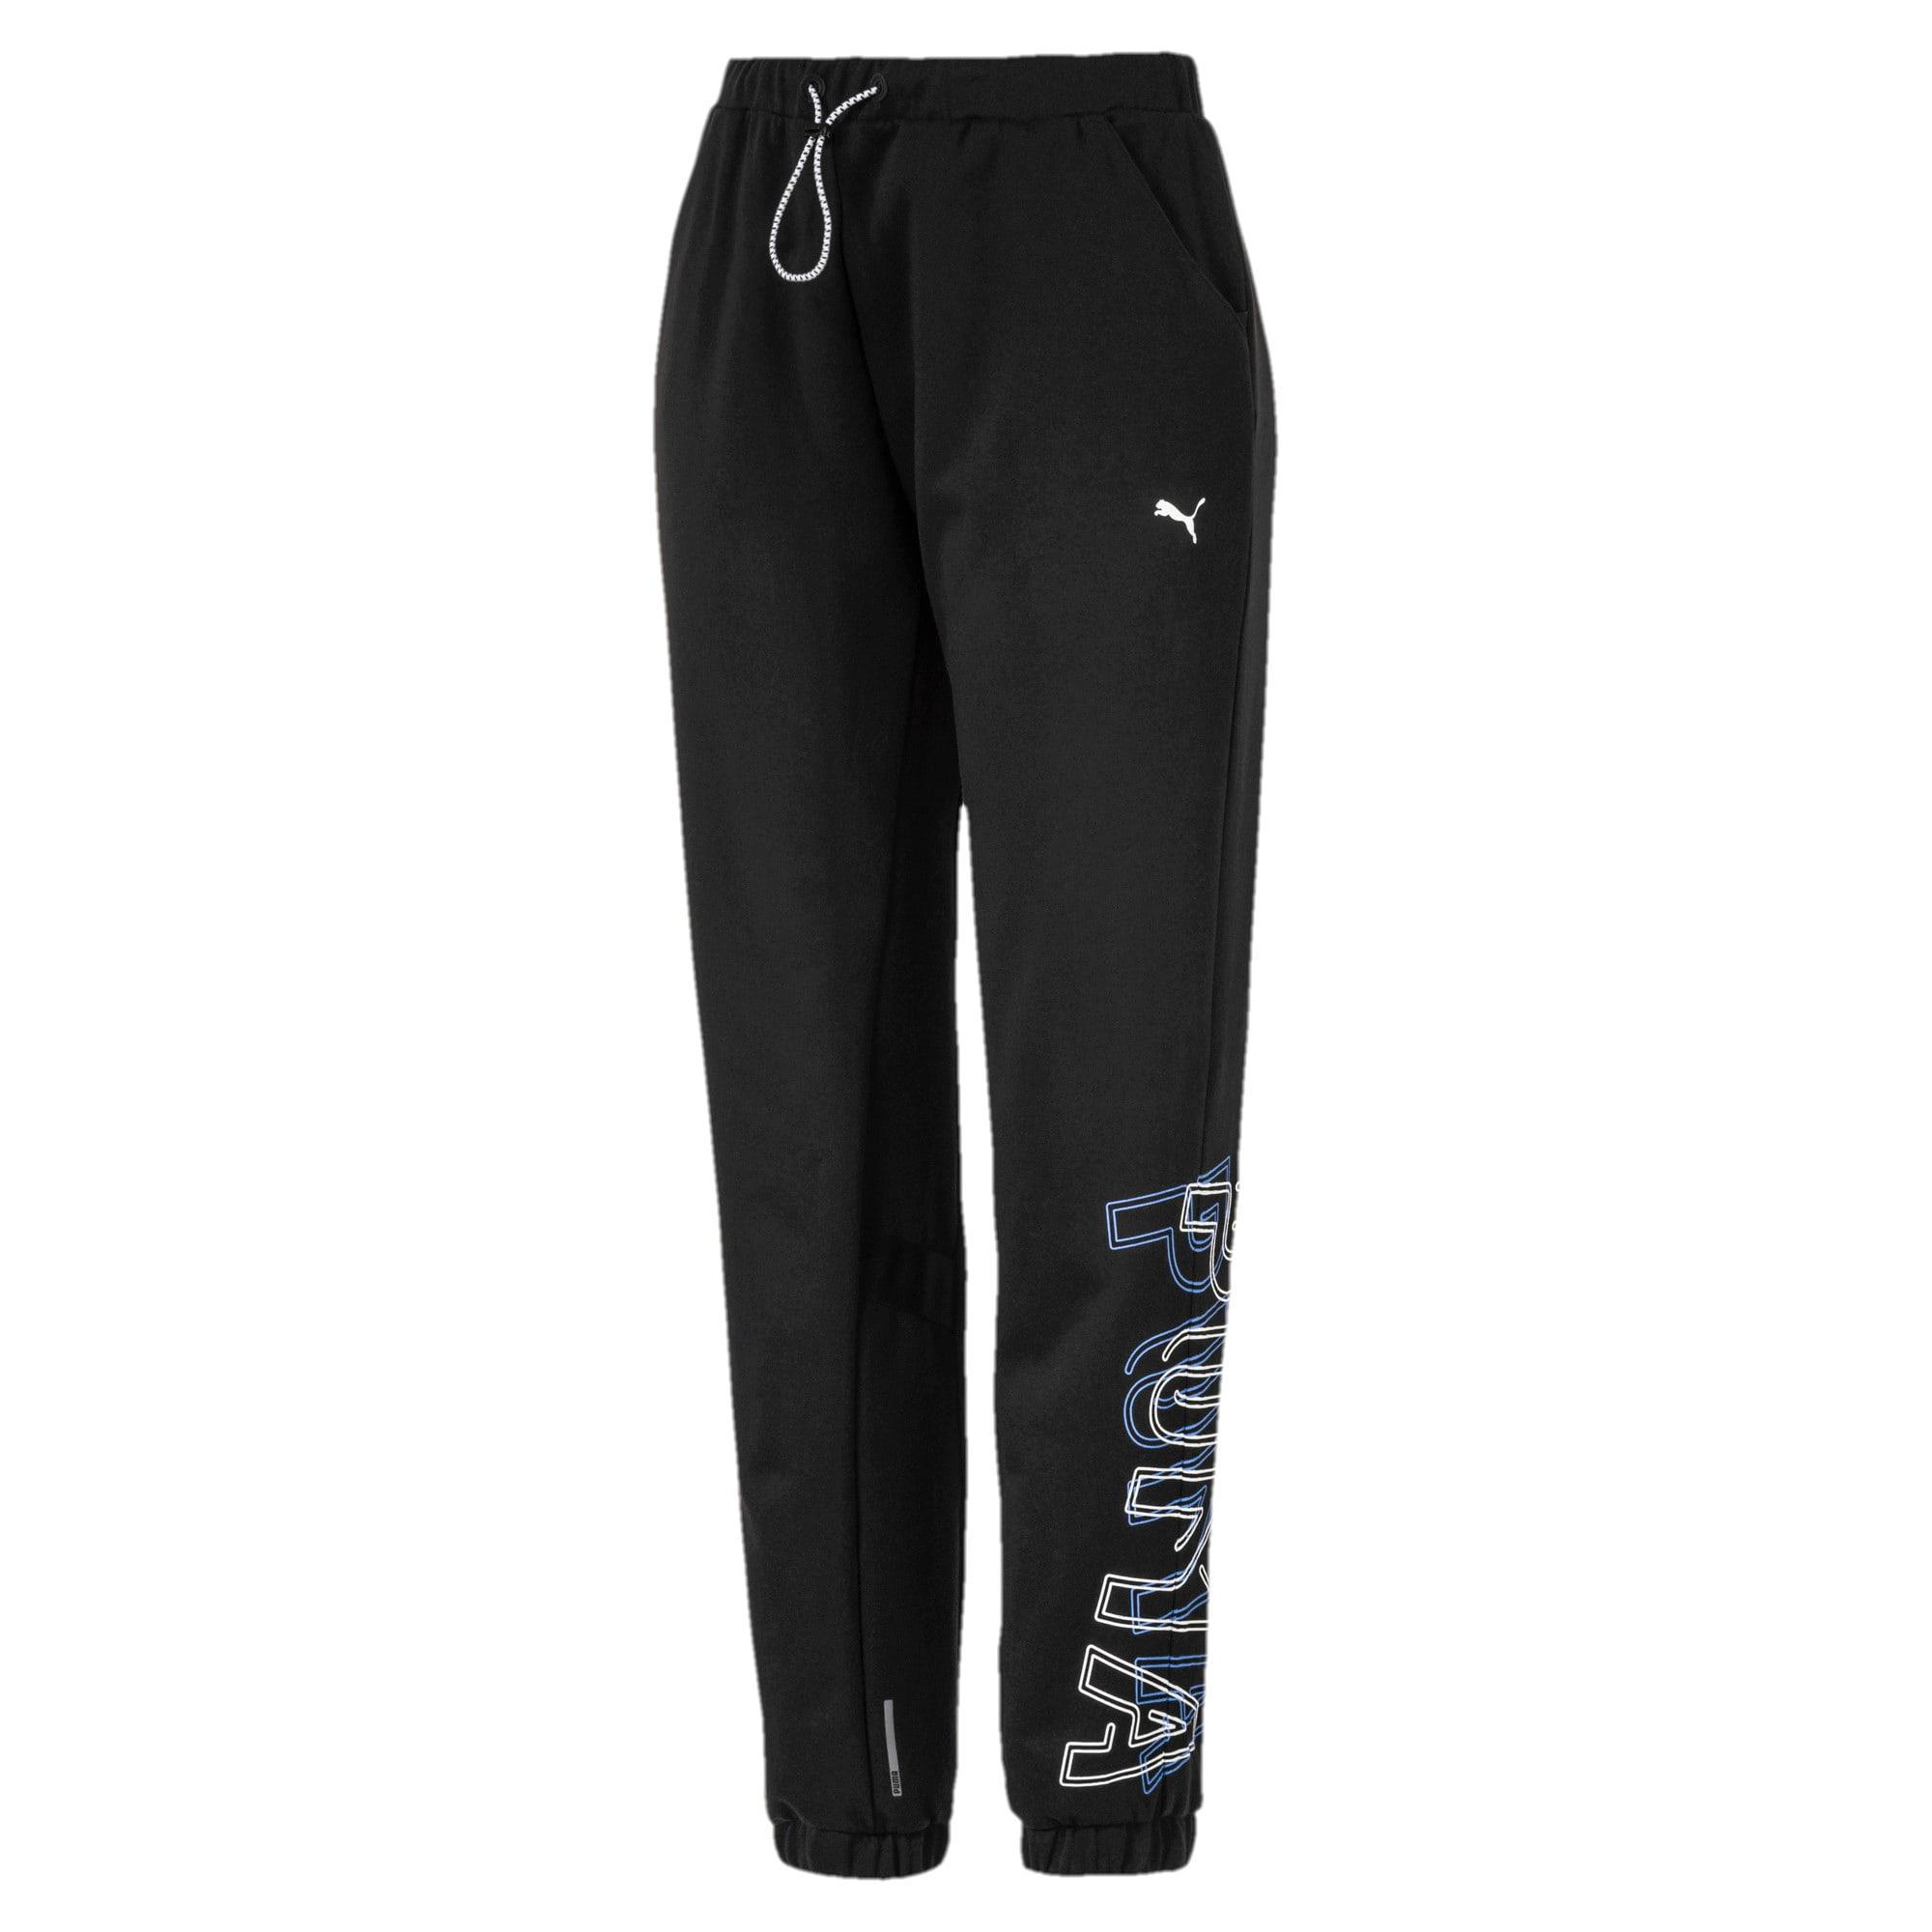 Thumbnail 4 of HIT Feel It Knitted Women's Training Sweatpants, Puma Black, medium-IND